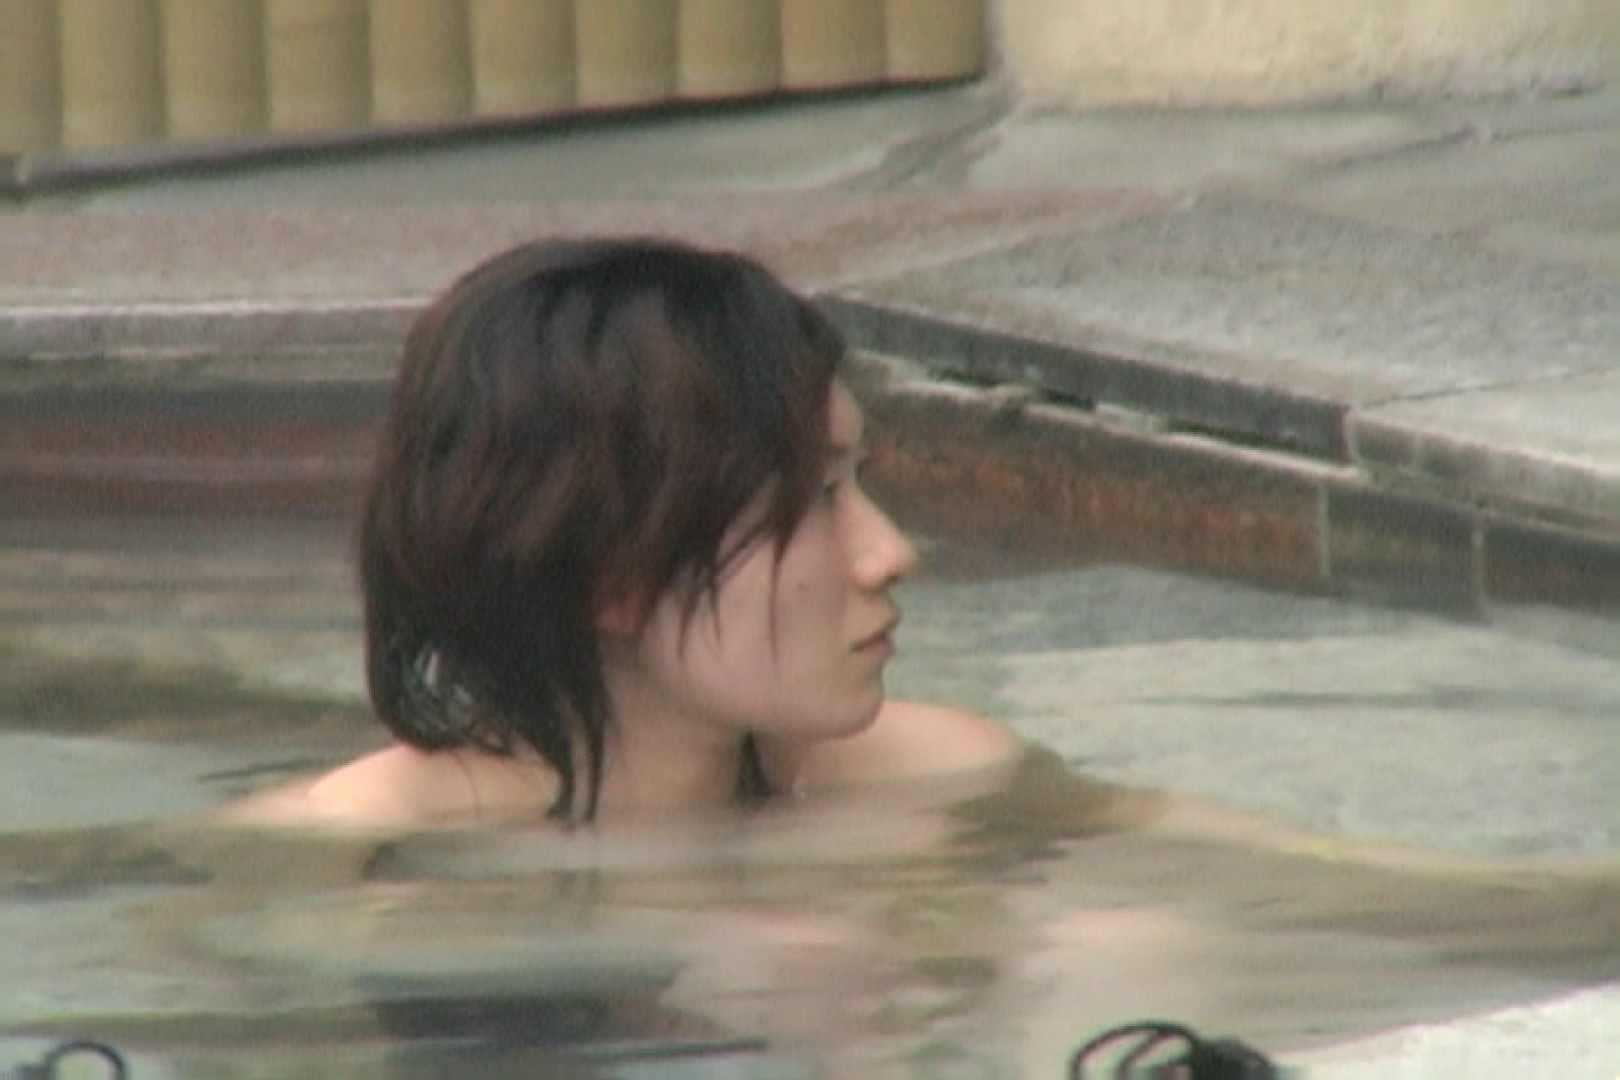 Aquaな露天風呂Vol.549 0  28連発 2